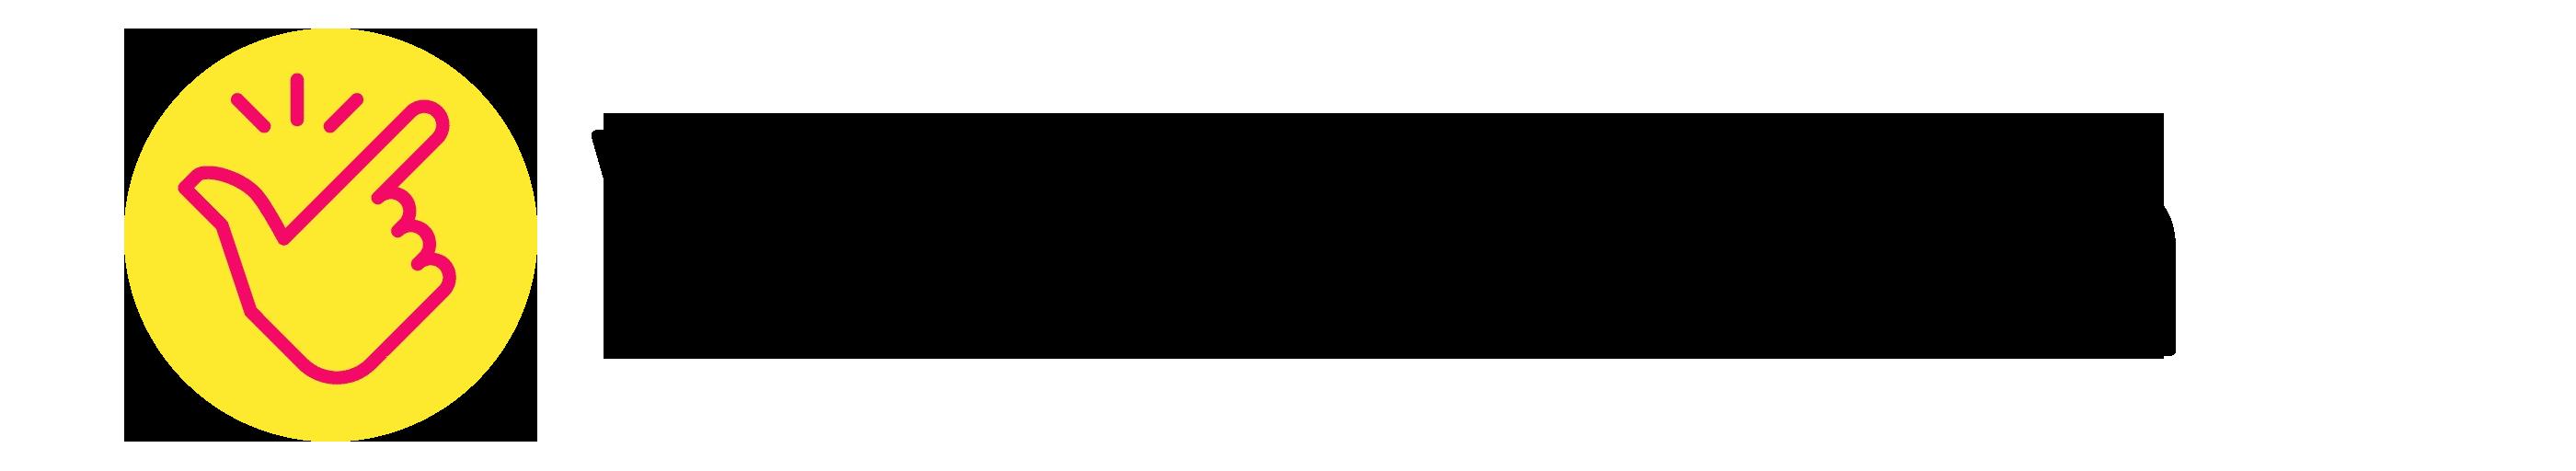 logo whitewash def